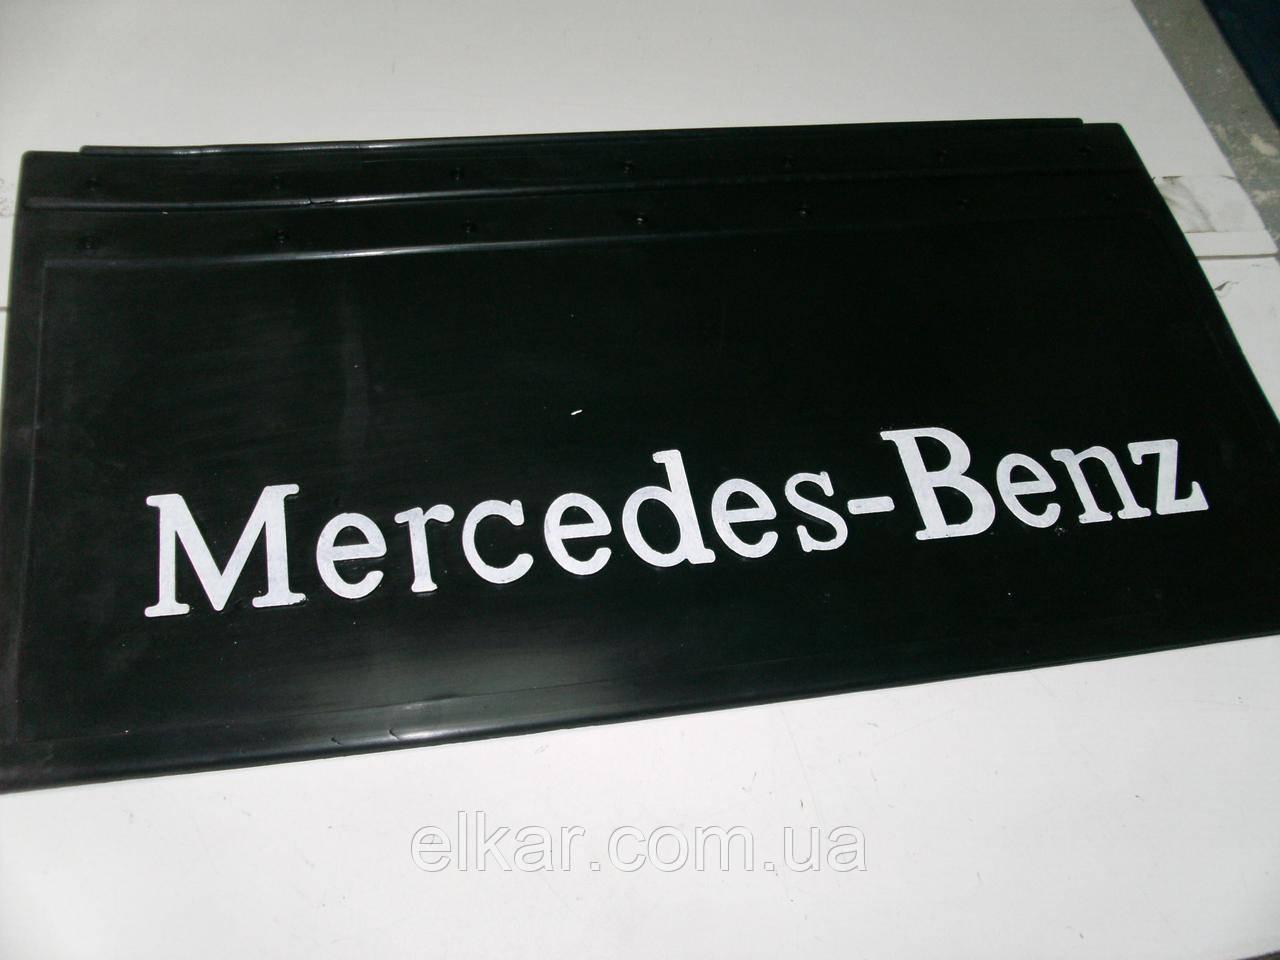 Бризковик LR1002 Mersedes-Benz  650х350 (Україна)